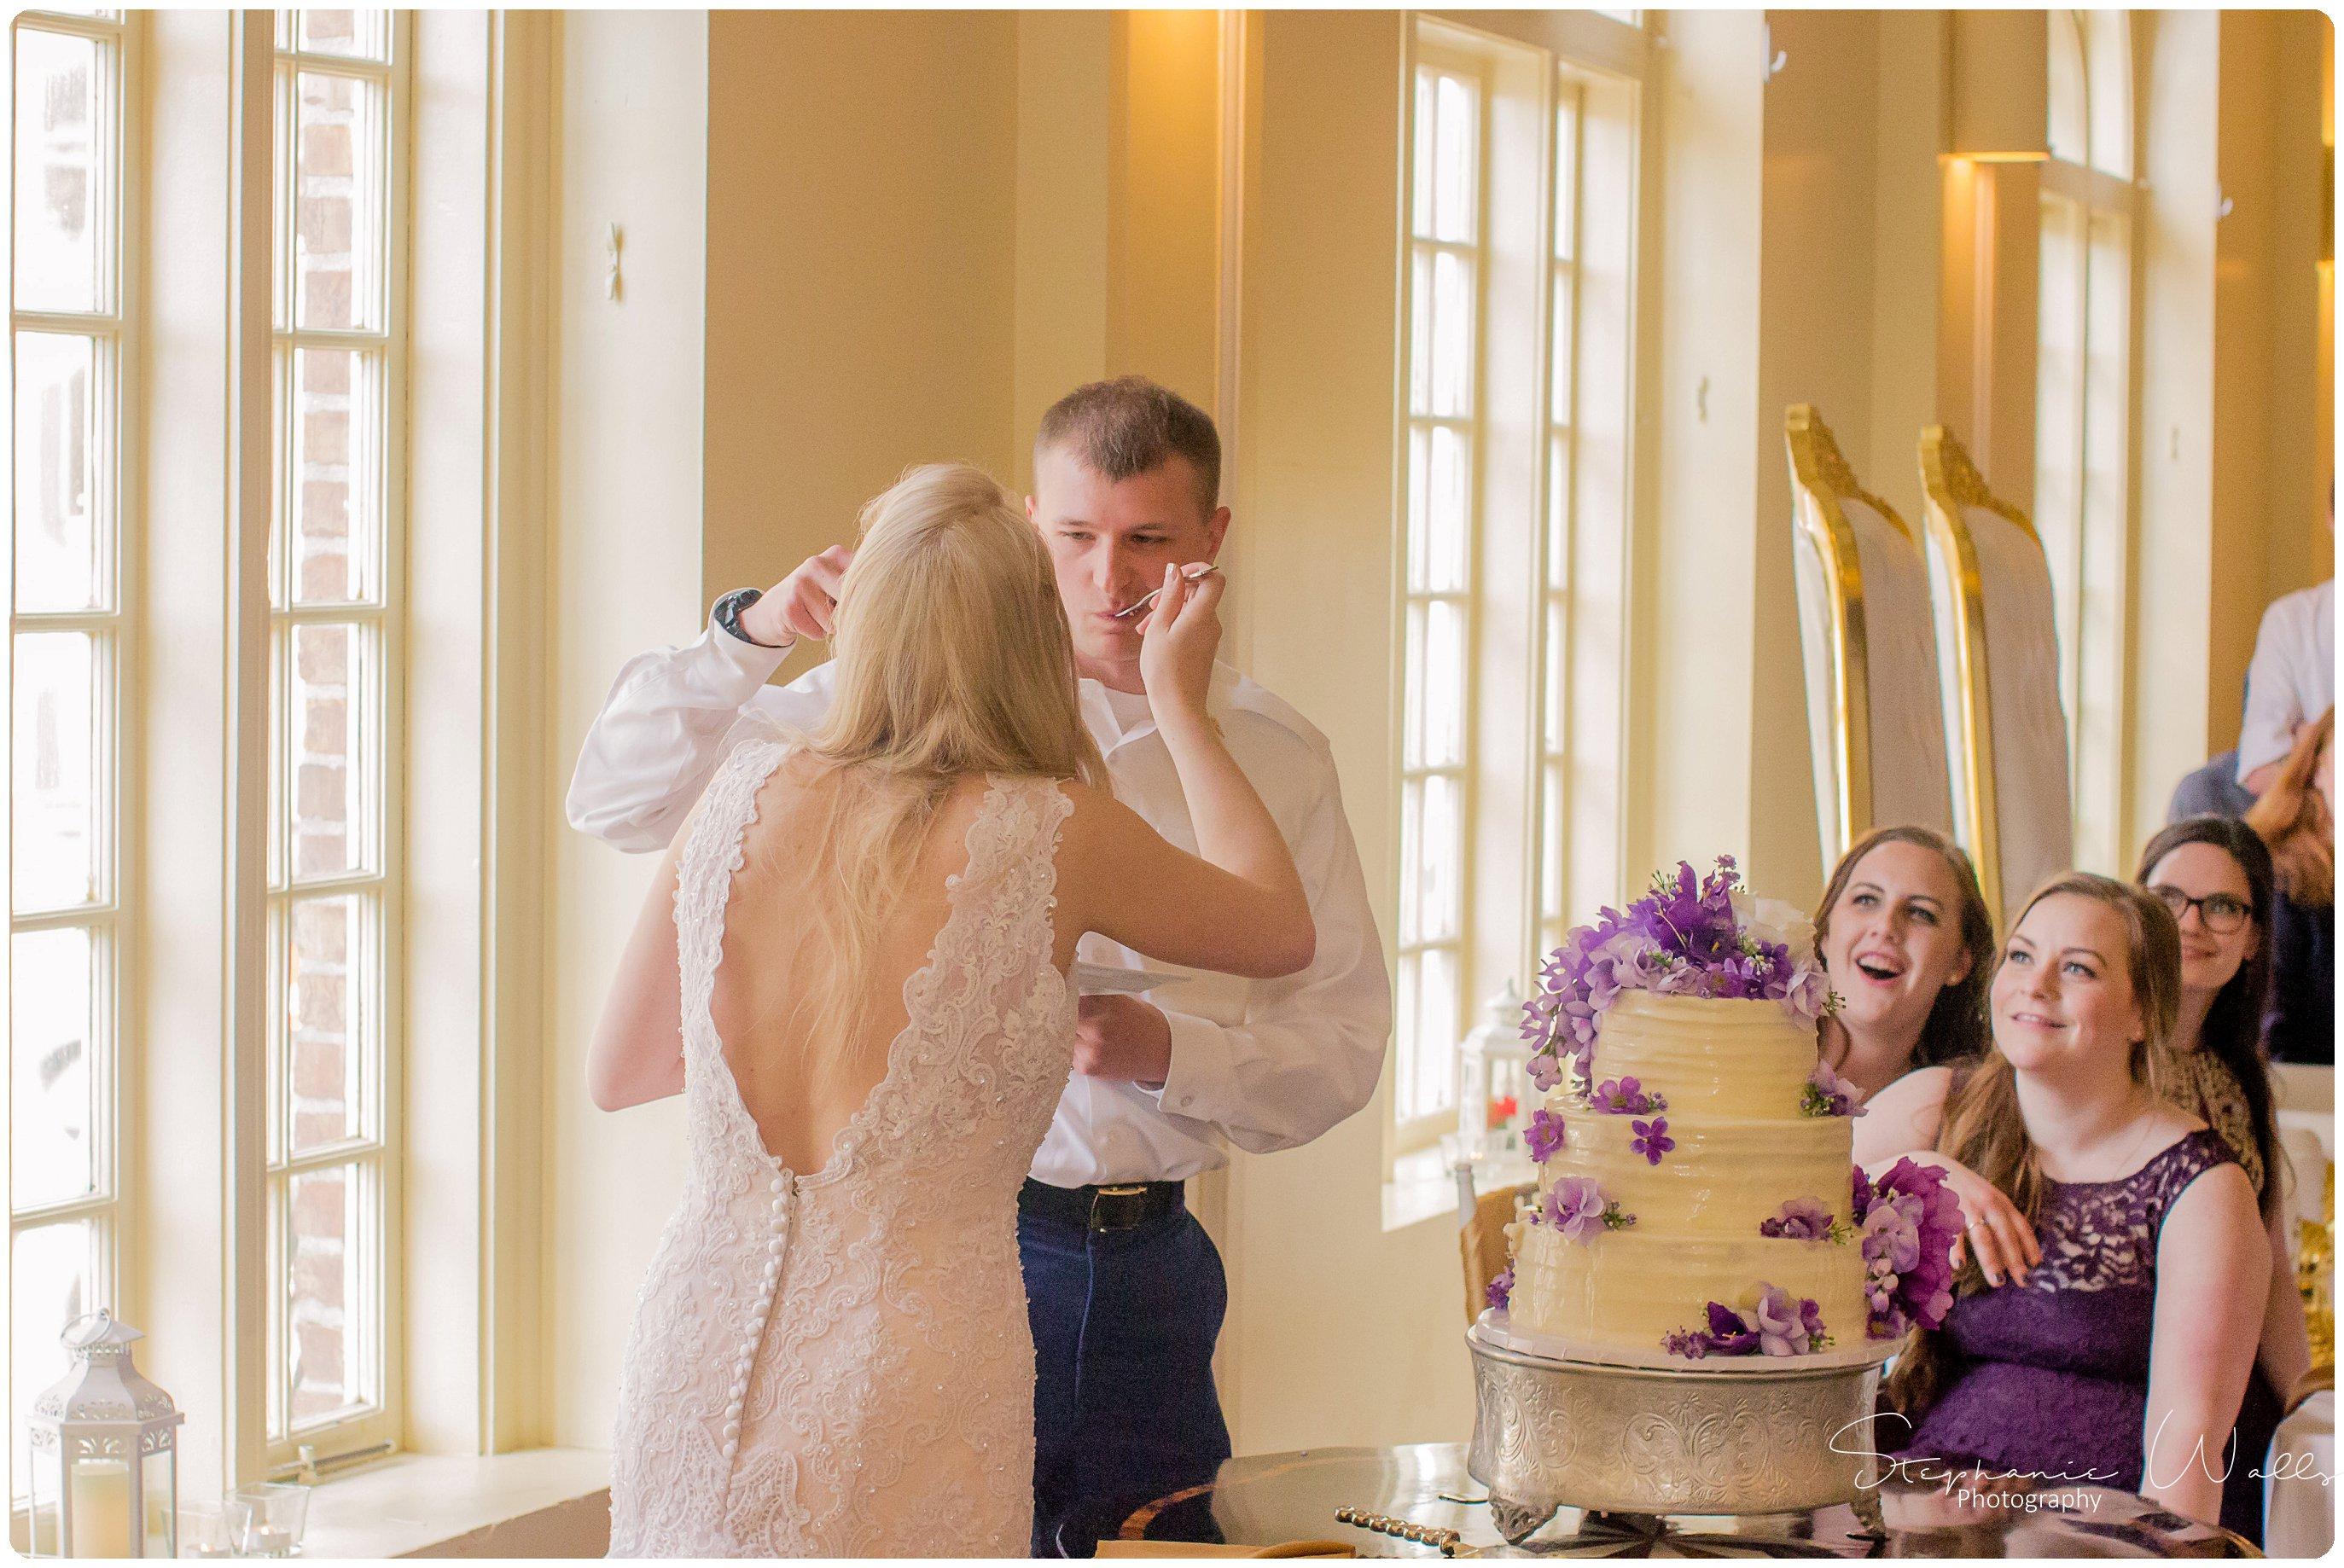 Sears Dinner Toast Cake 155 The Hero & The Starlet | Monte Cristo Ballroom | Stephanie Walls Photography Weddings